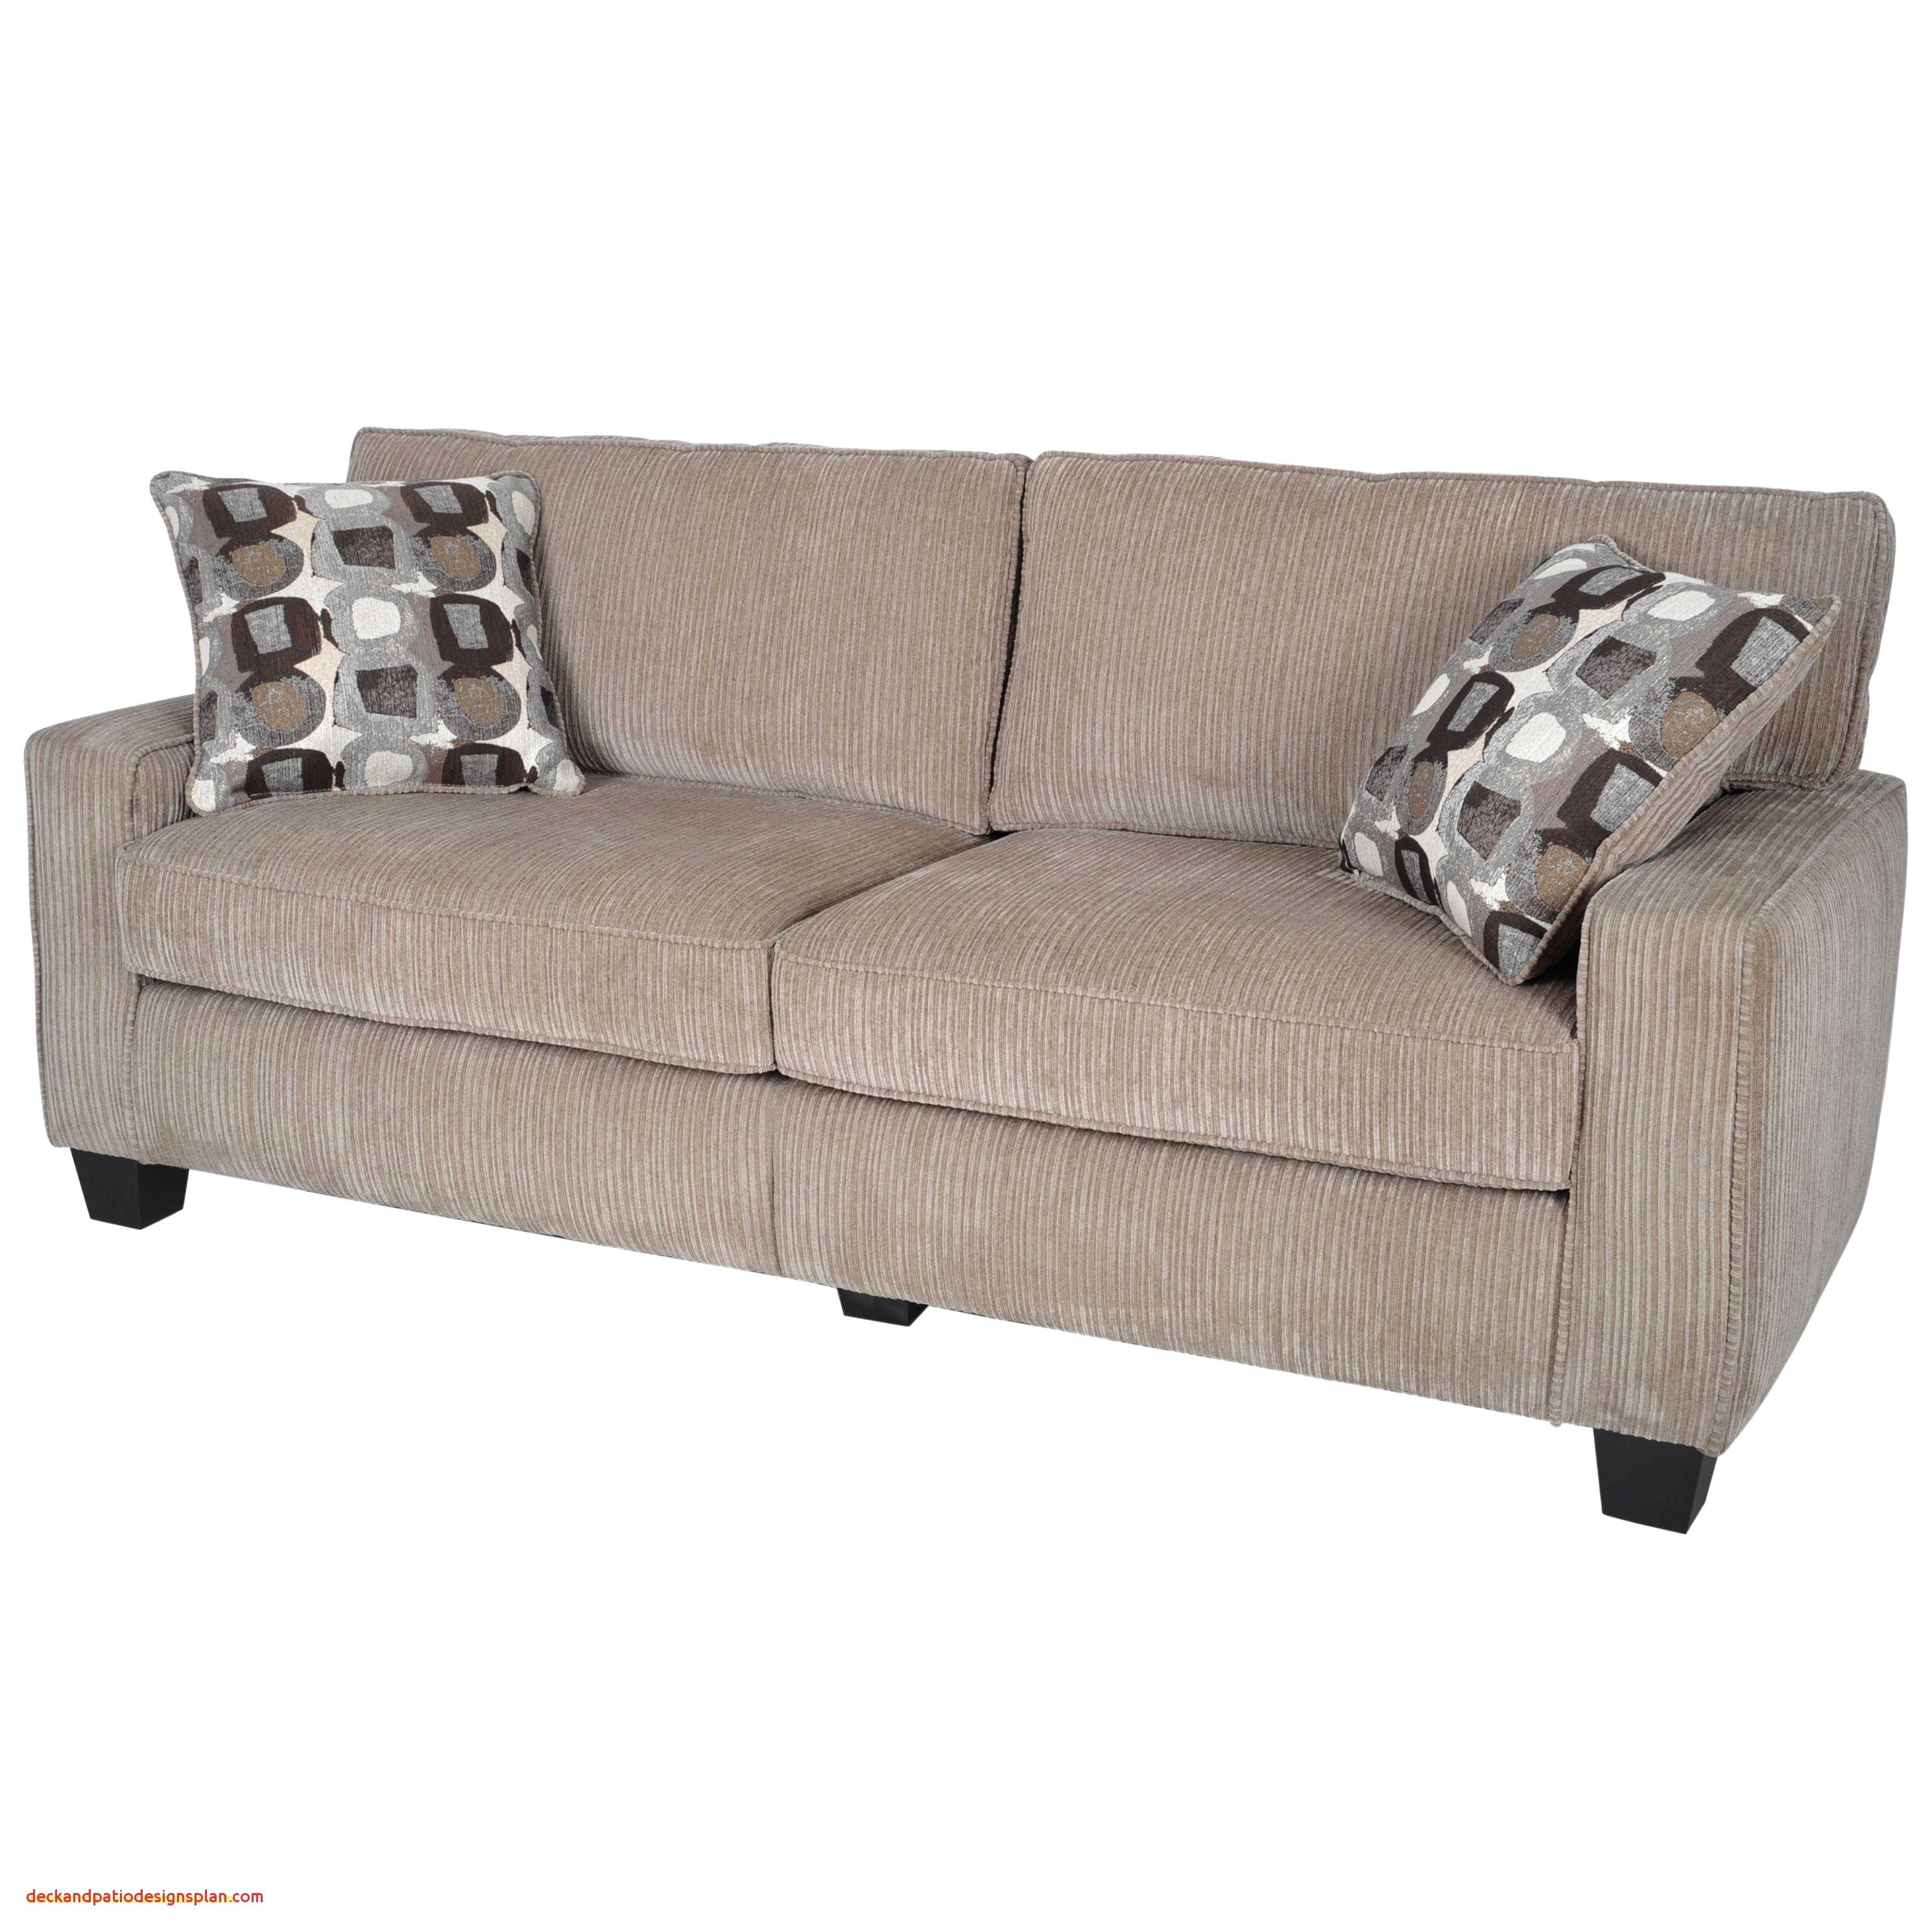 corner sofa bed with storage beautiful ikea ektorp sofa 2er sofa ikea poka j dzienny ikea salon